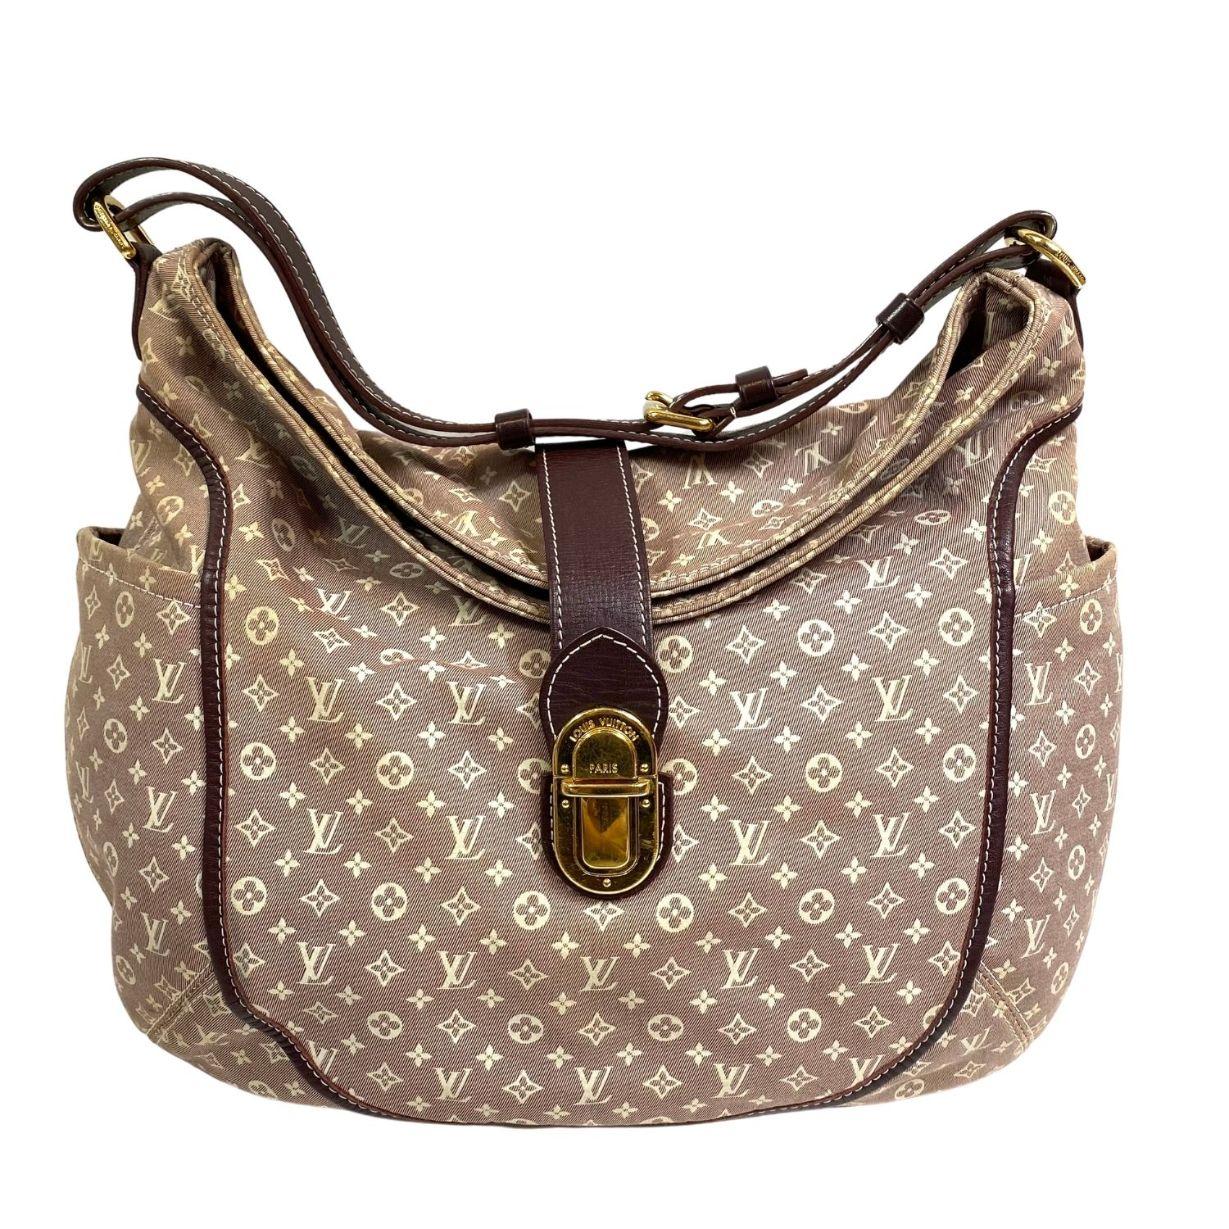 Bolsa Louis Vuitton Romance Idylle Sepia